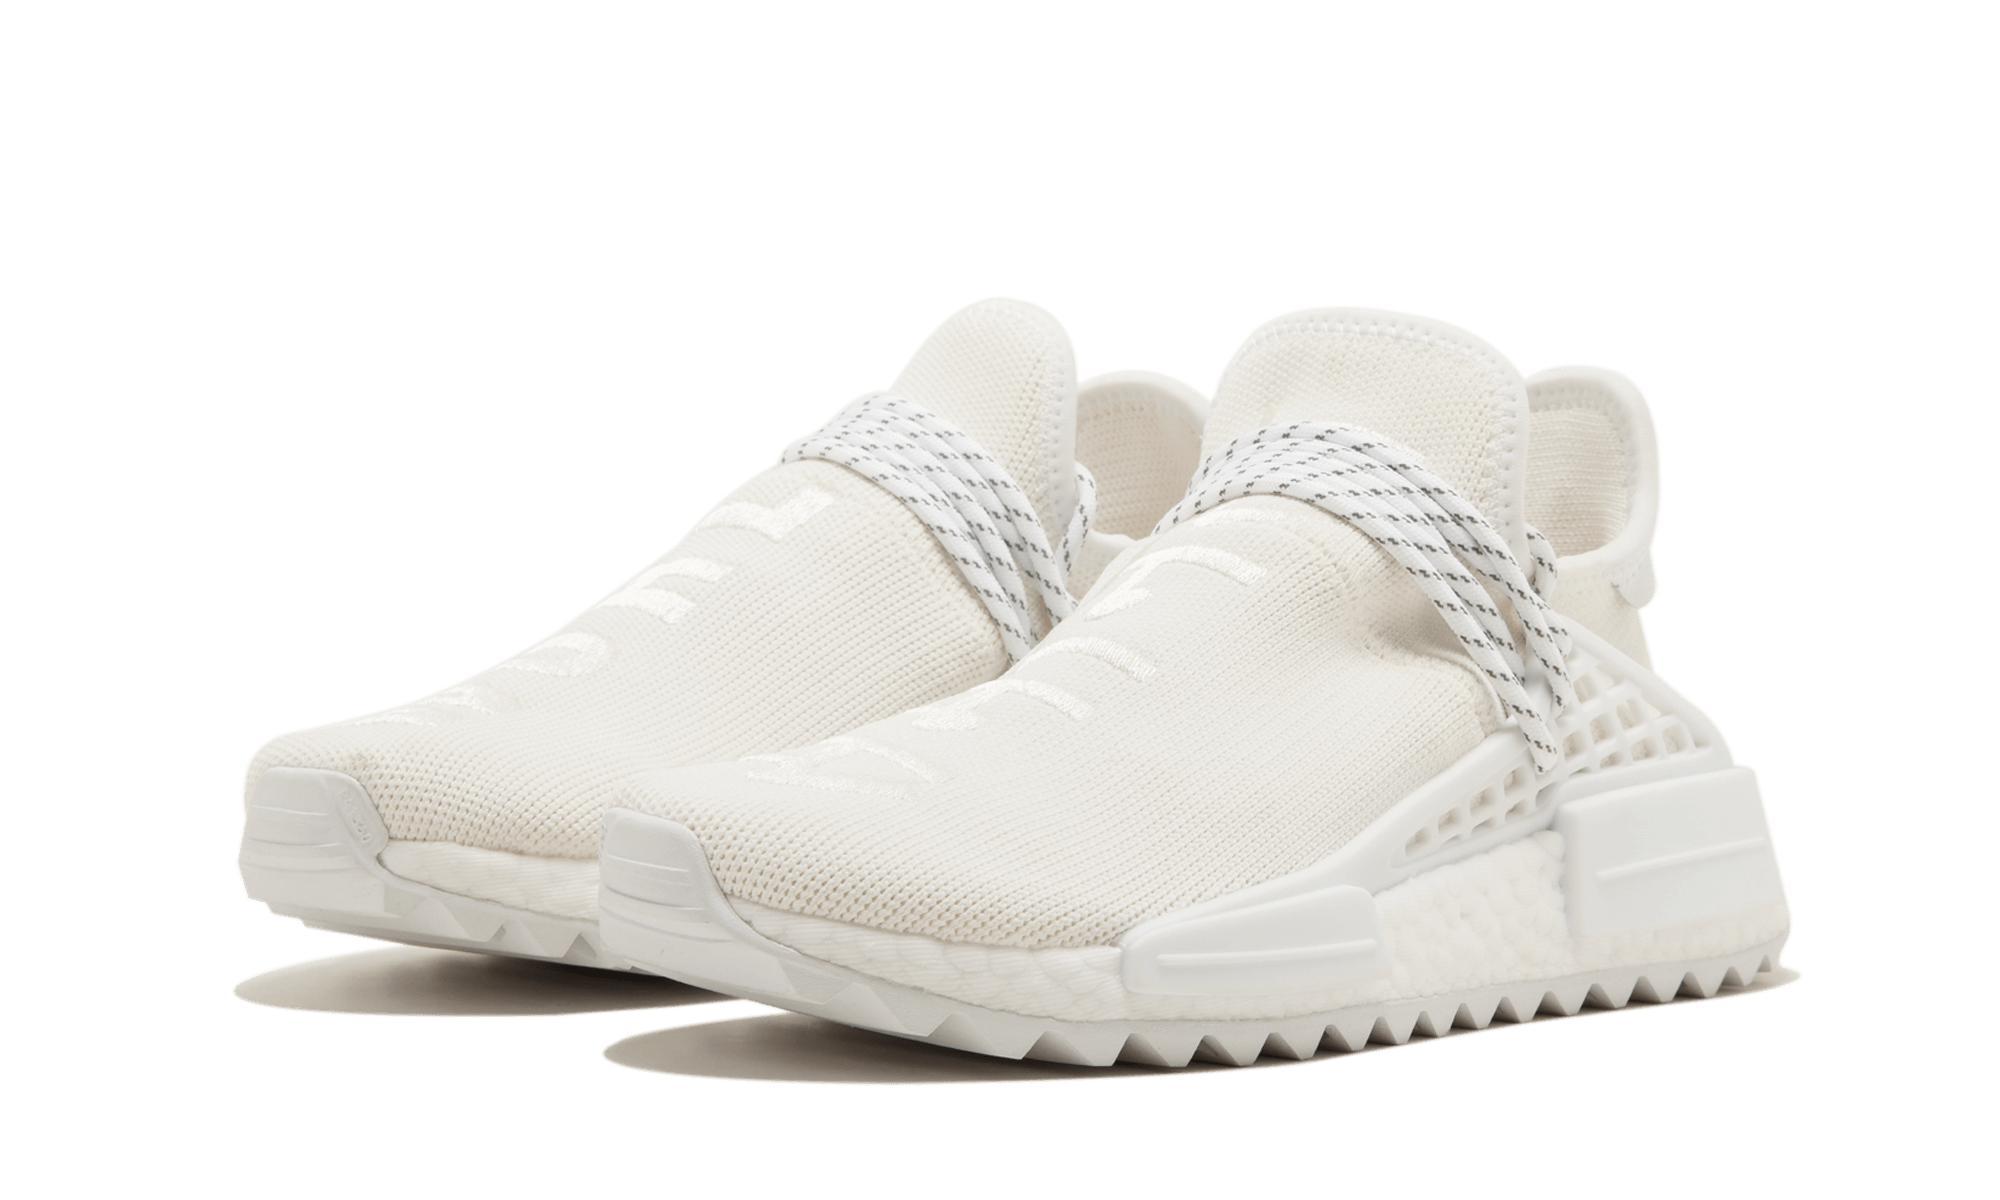 8b52c8c7e1762 adidas Pharrell Williams Human Race Nmd Tr in White for Men - Lyst